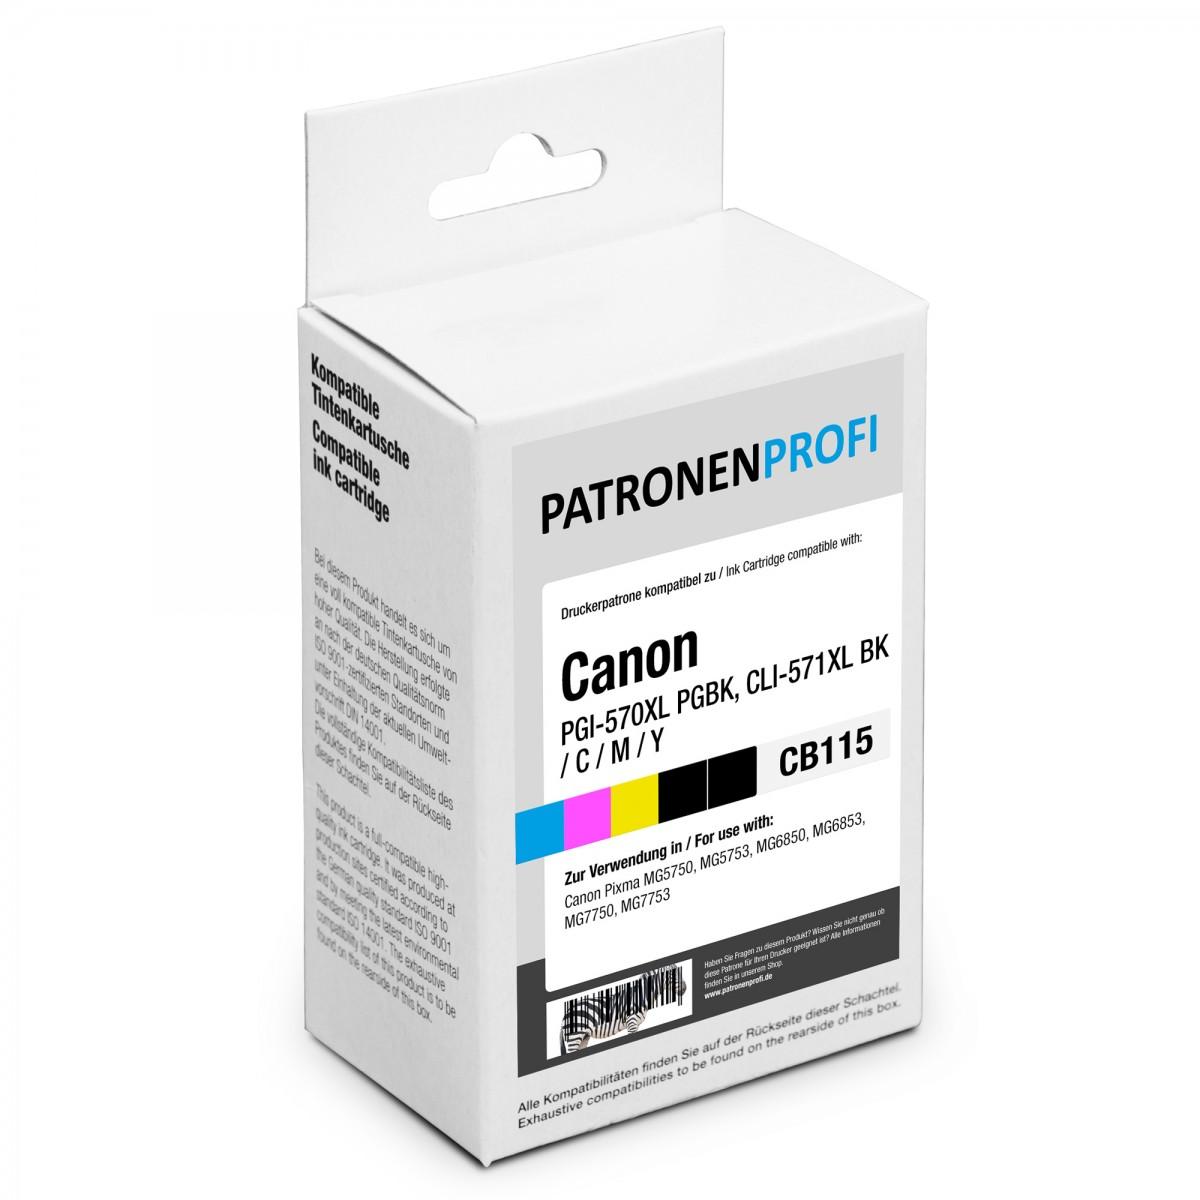 Patronenprofi Spar Set Fr Canon Pgi 570xl Cli 571xl Schwarz Cyan Ink Cartridge 29 Magenta